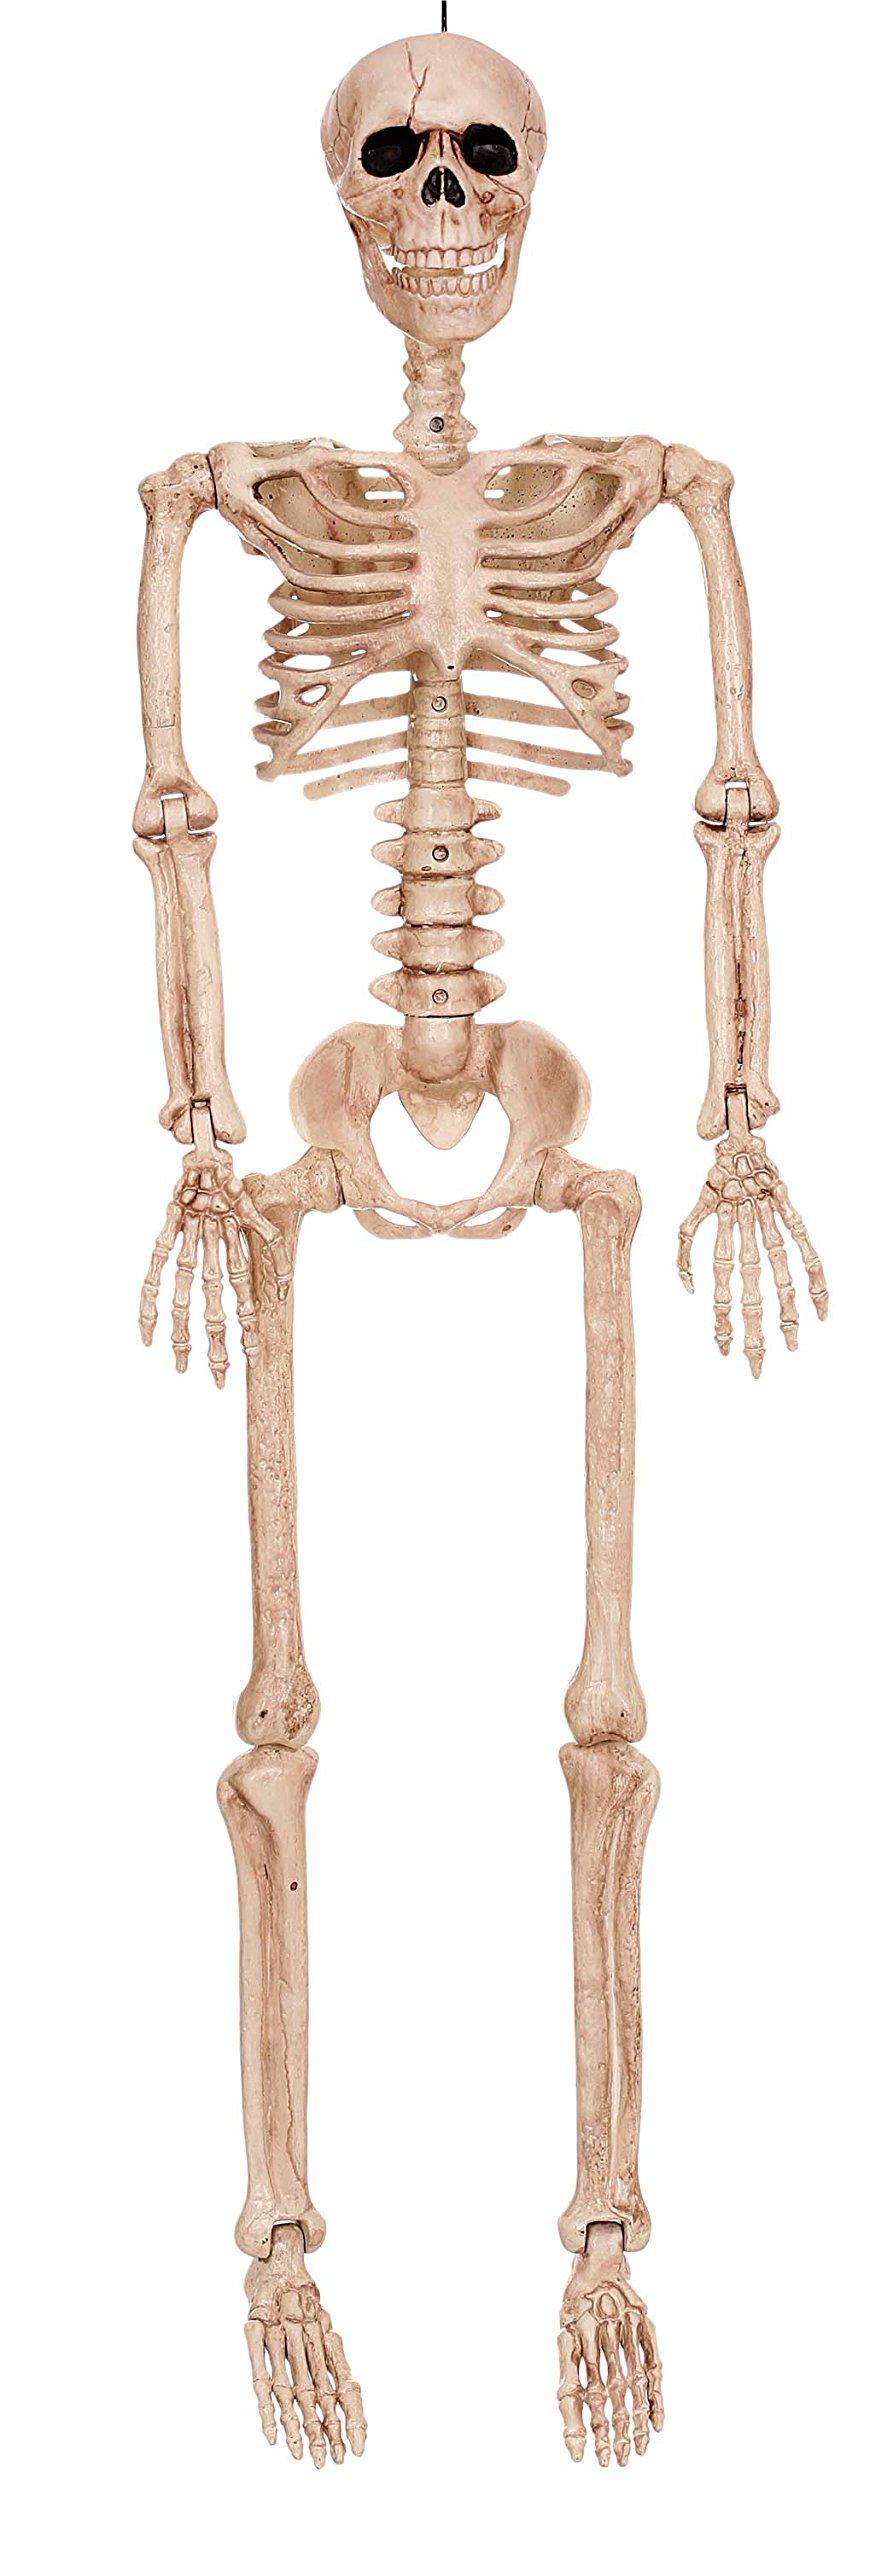 Crazy Bonez Posable Skeleton Decoration, 36''